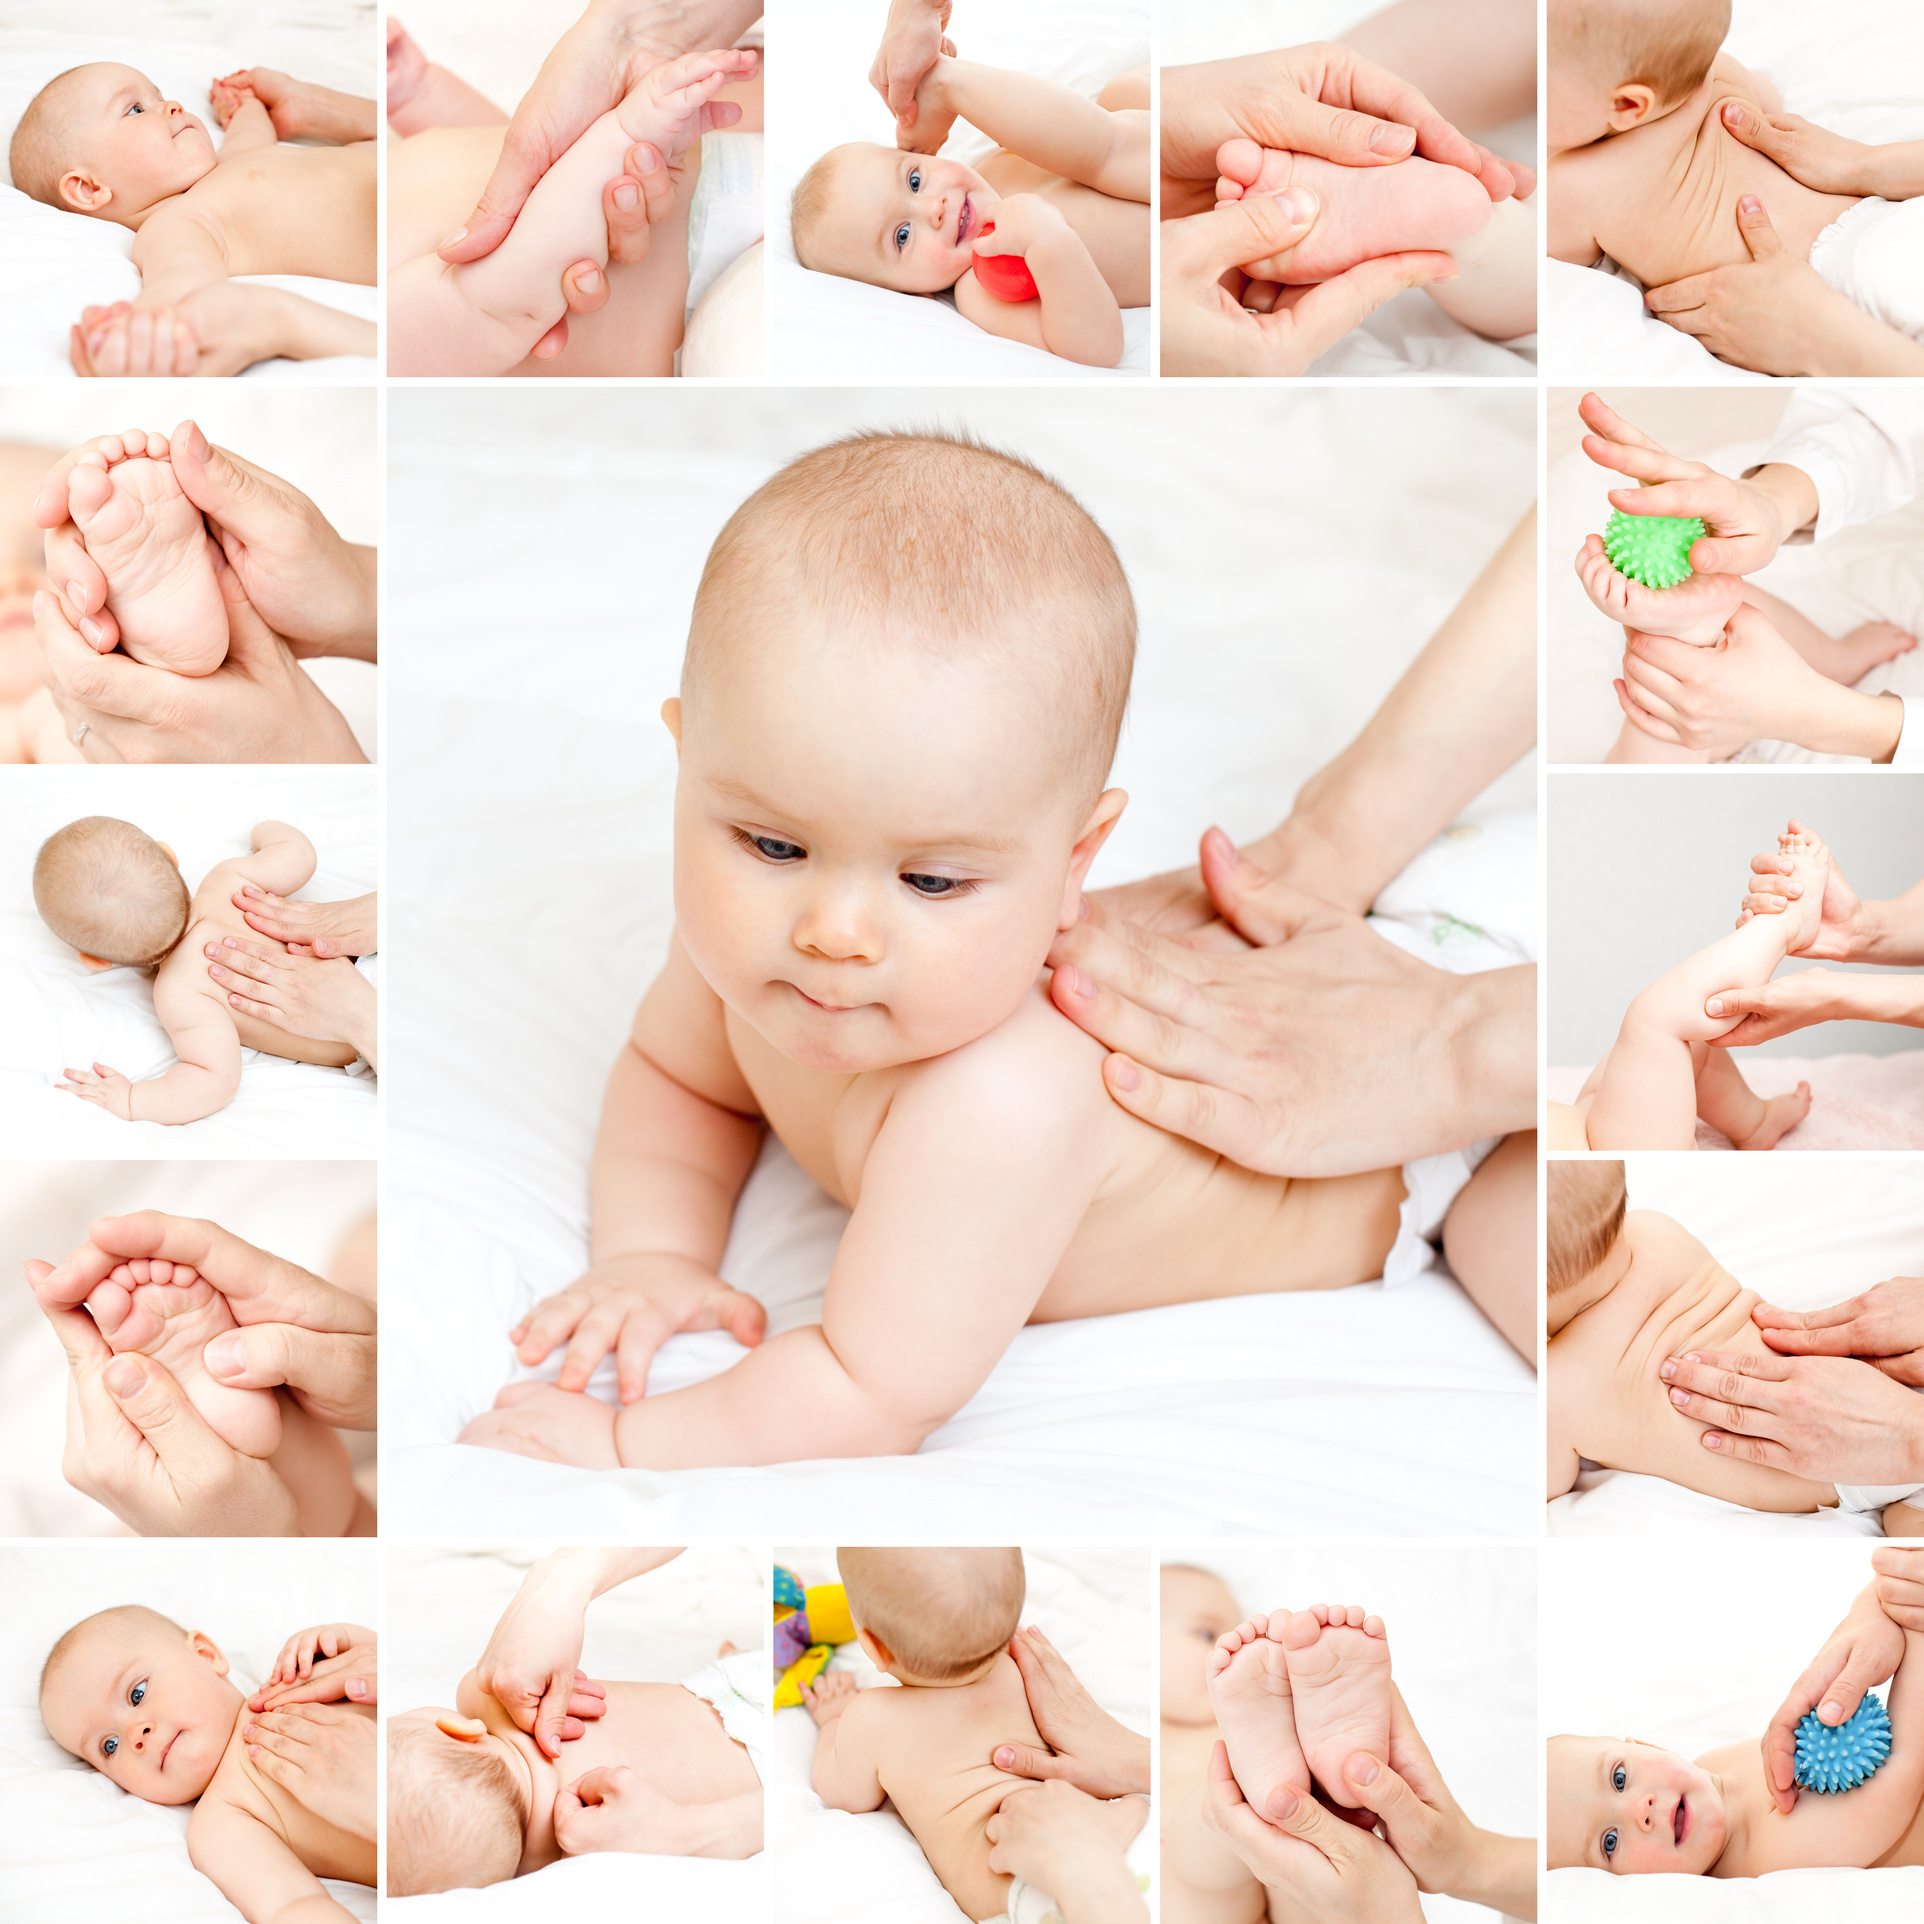 Baby massage videossee all our baby massage videos